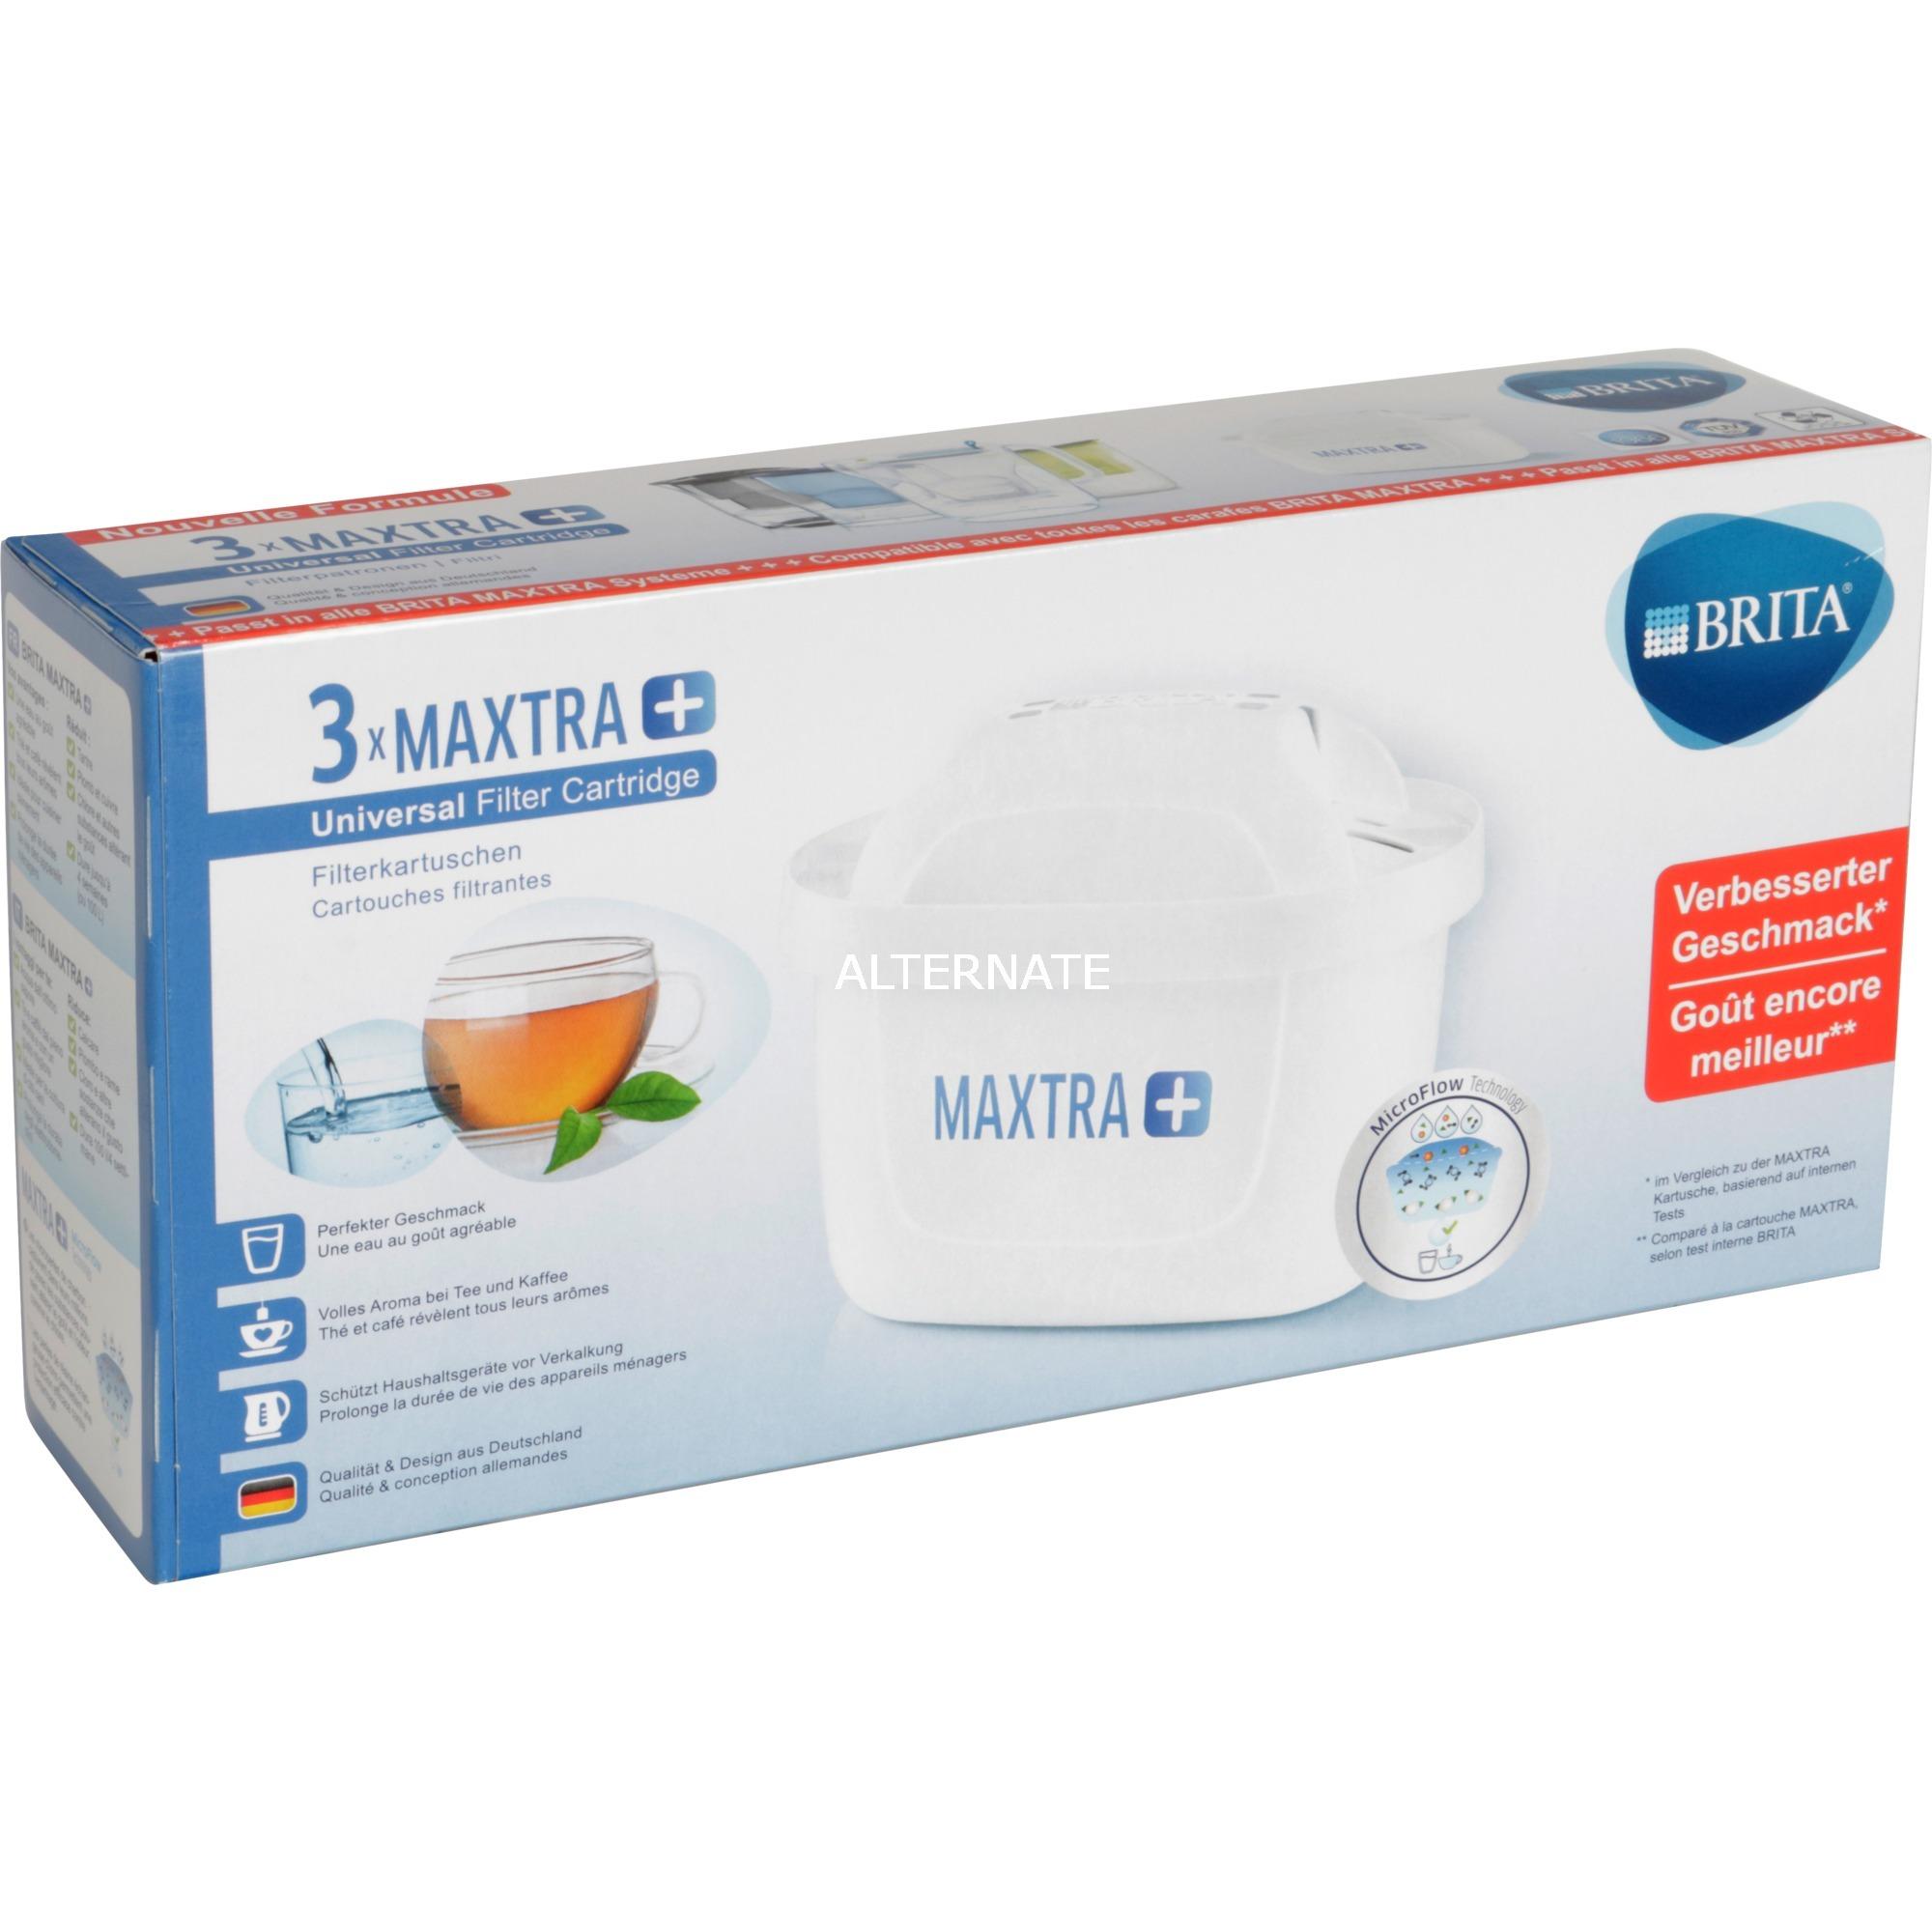 1023120 suministro de filtro de agua Cartucho 3 pieza(s), Filtro para agua potable